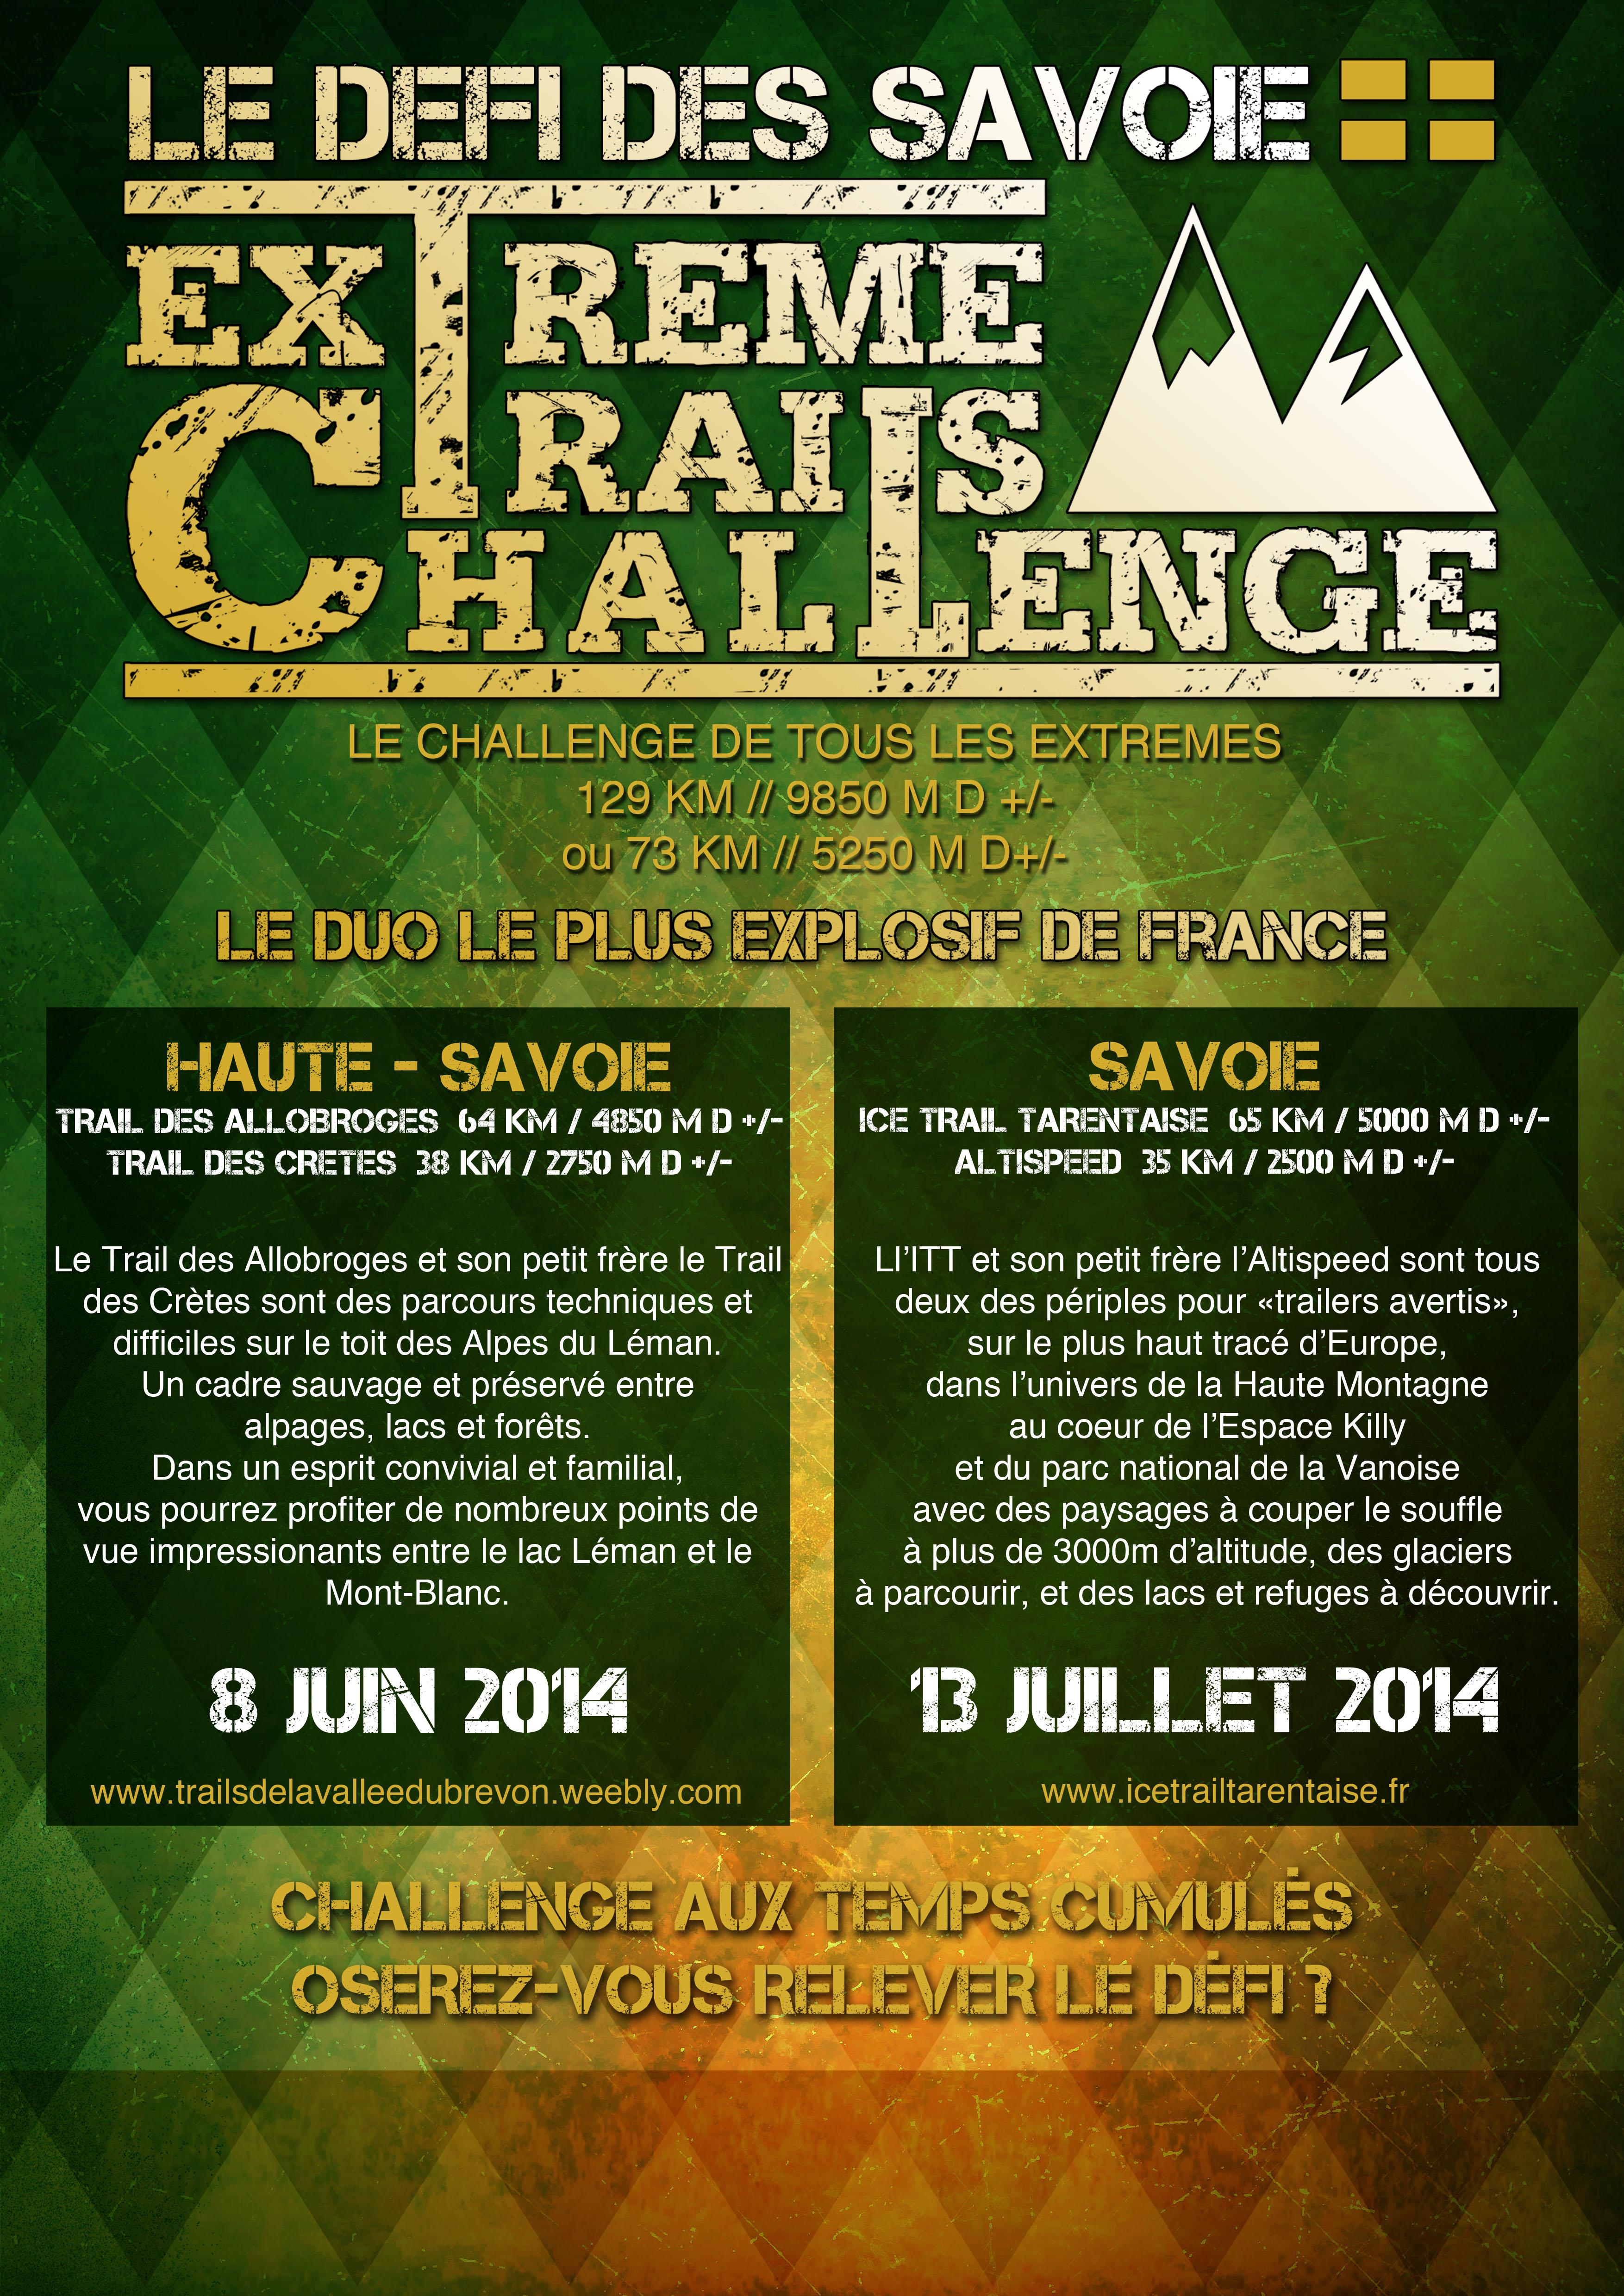 EXTREME TRAILS CHALLENGE 2014